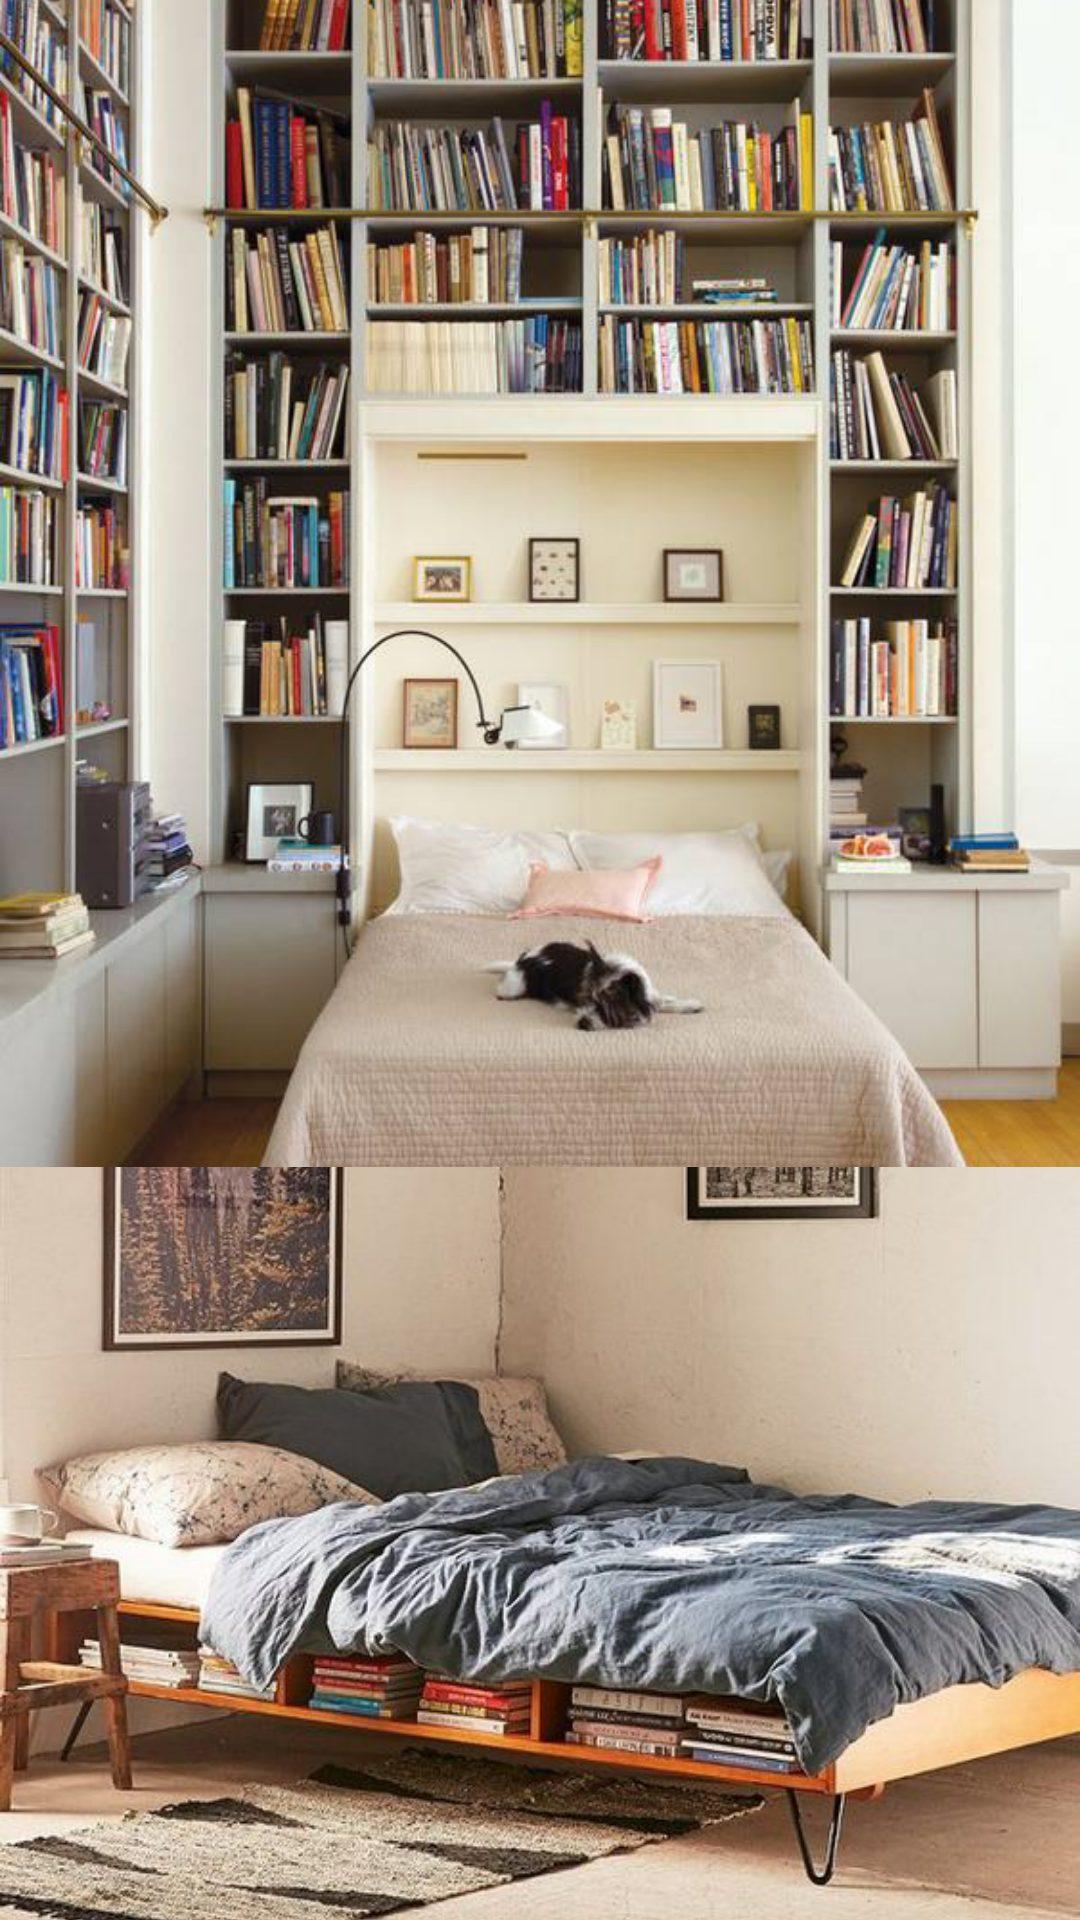 bookworm bedroom ideas